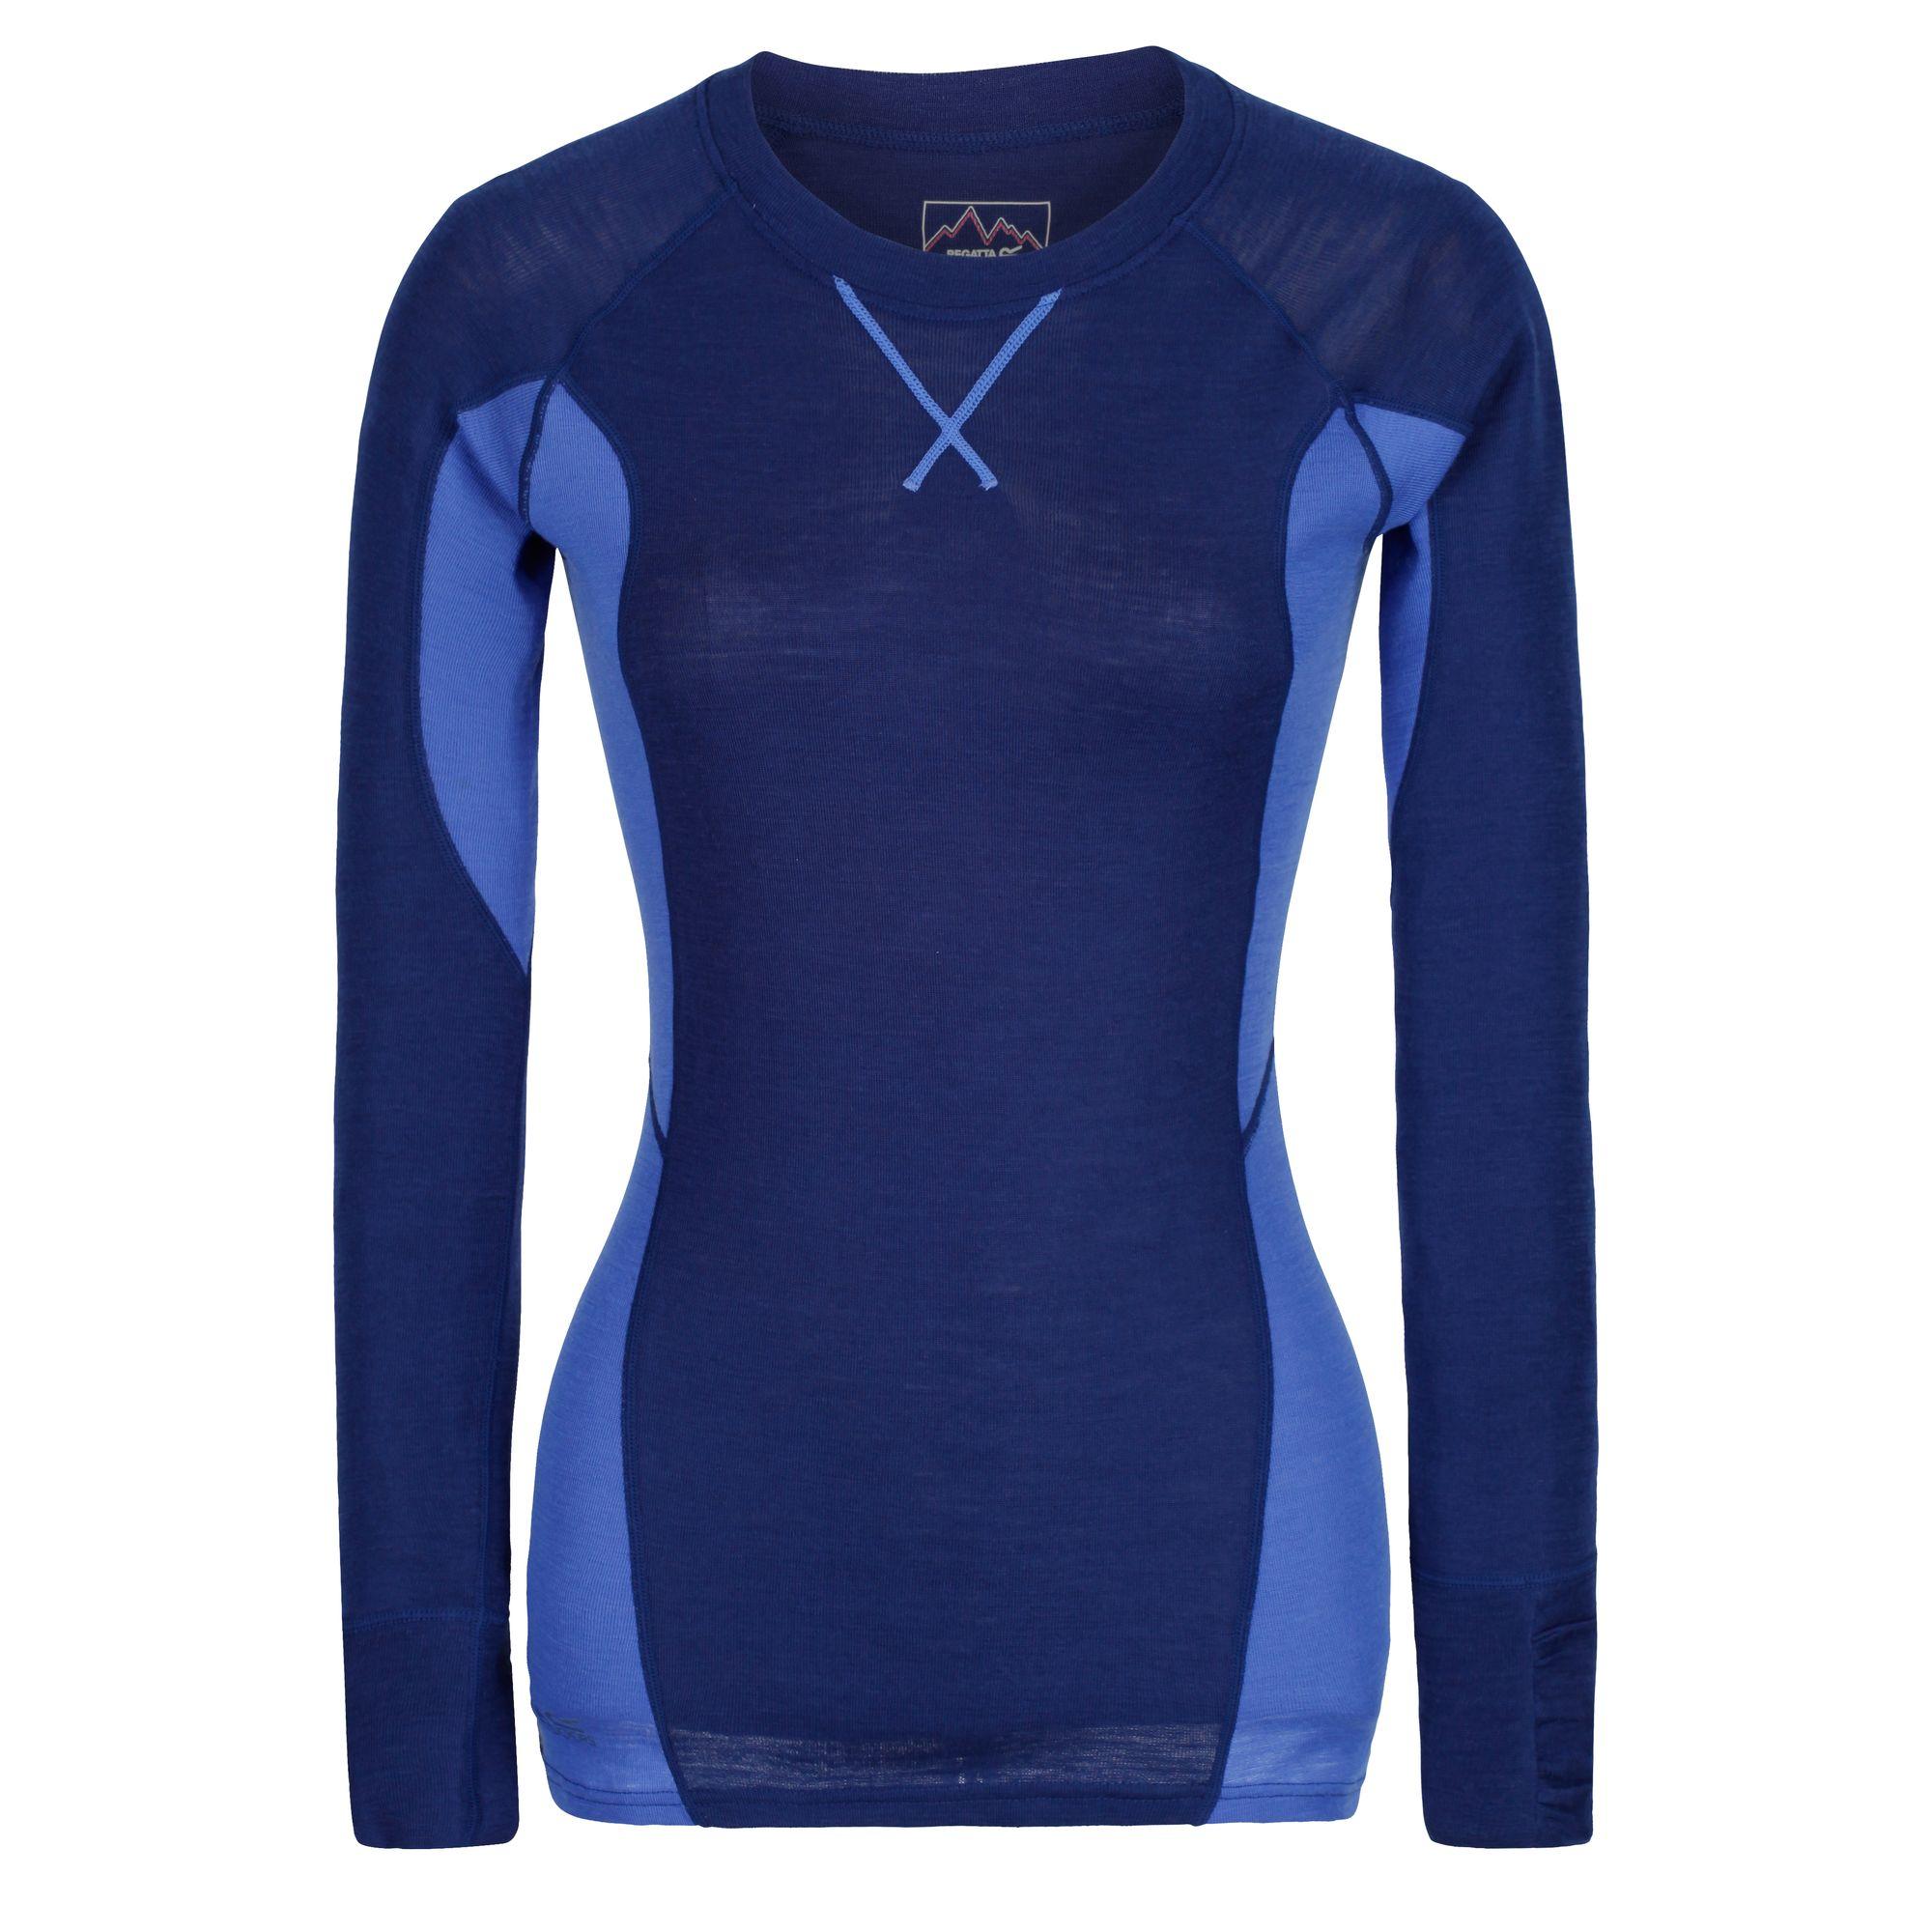 Regatta-Camiseta-de-manga-corta-interior-modelo-Beru-para-mujer-RG2897